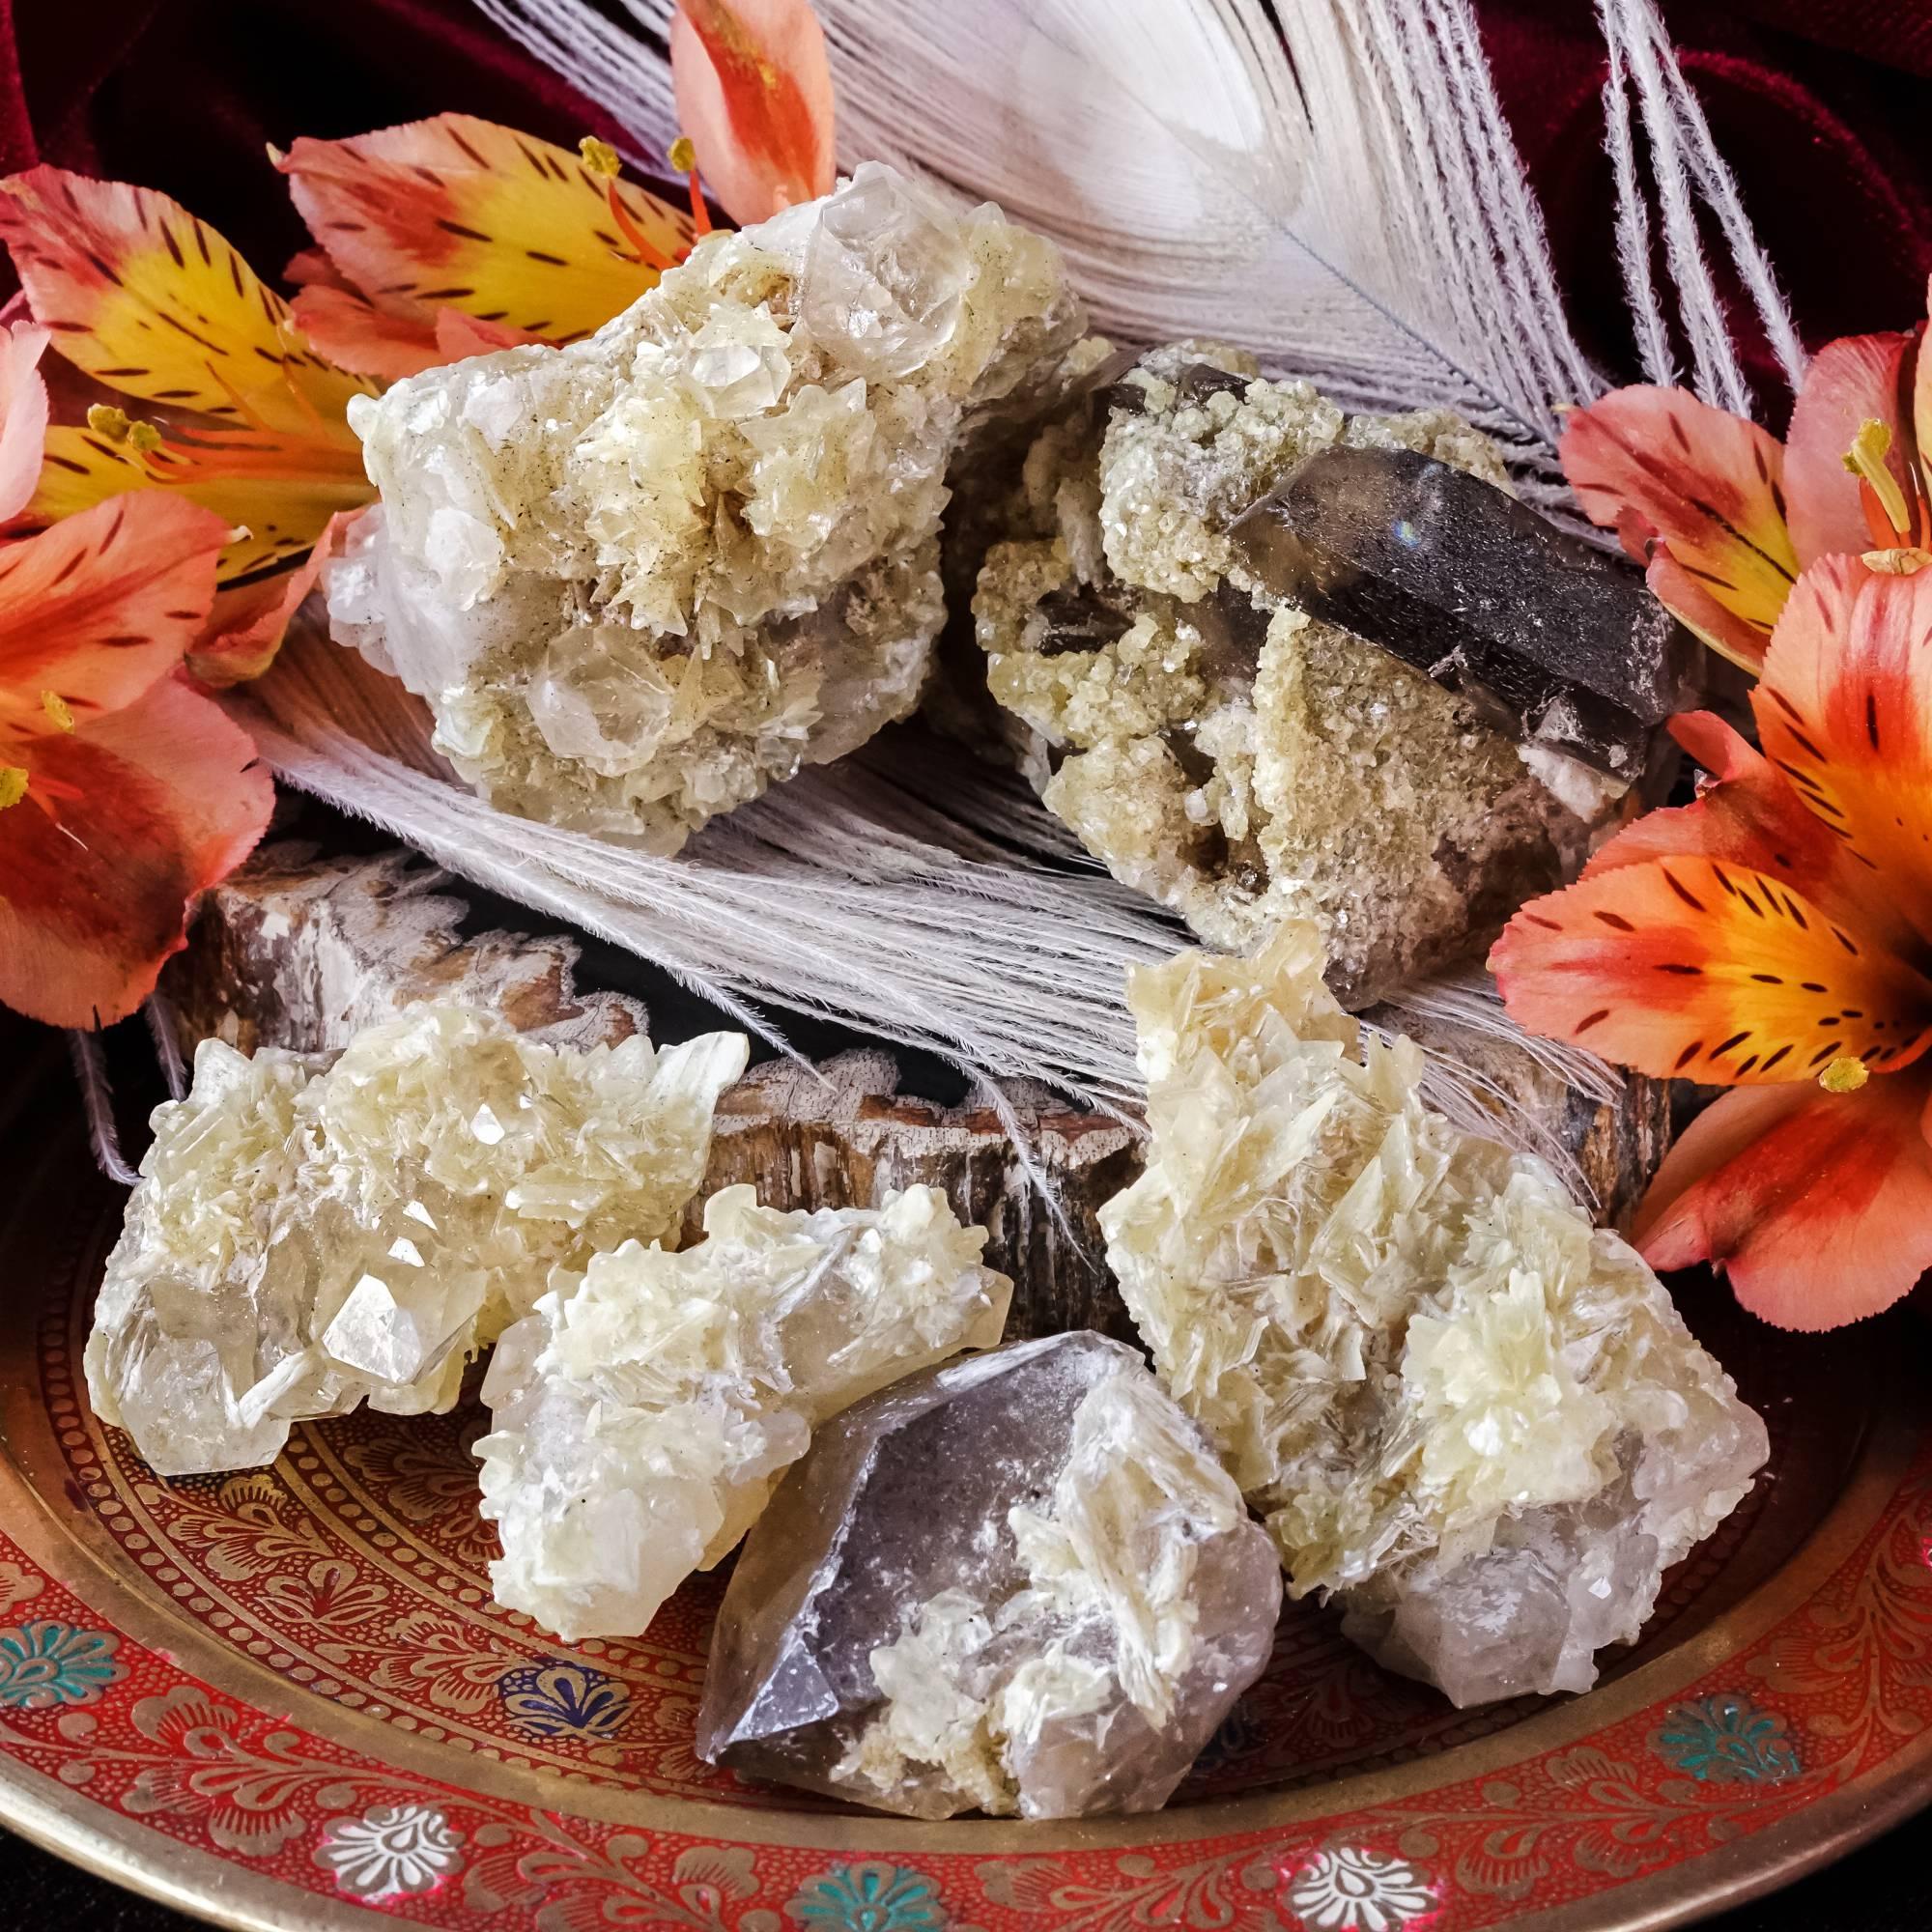 star mica on quartz specimens